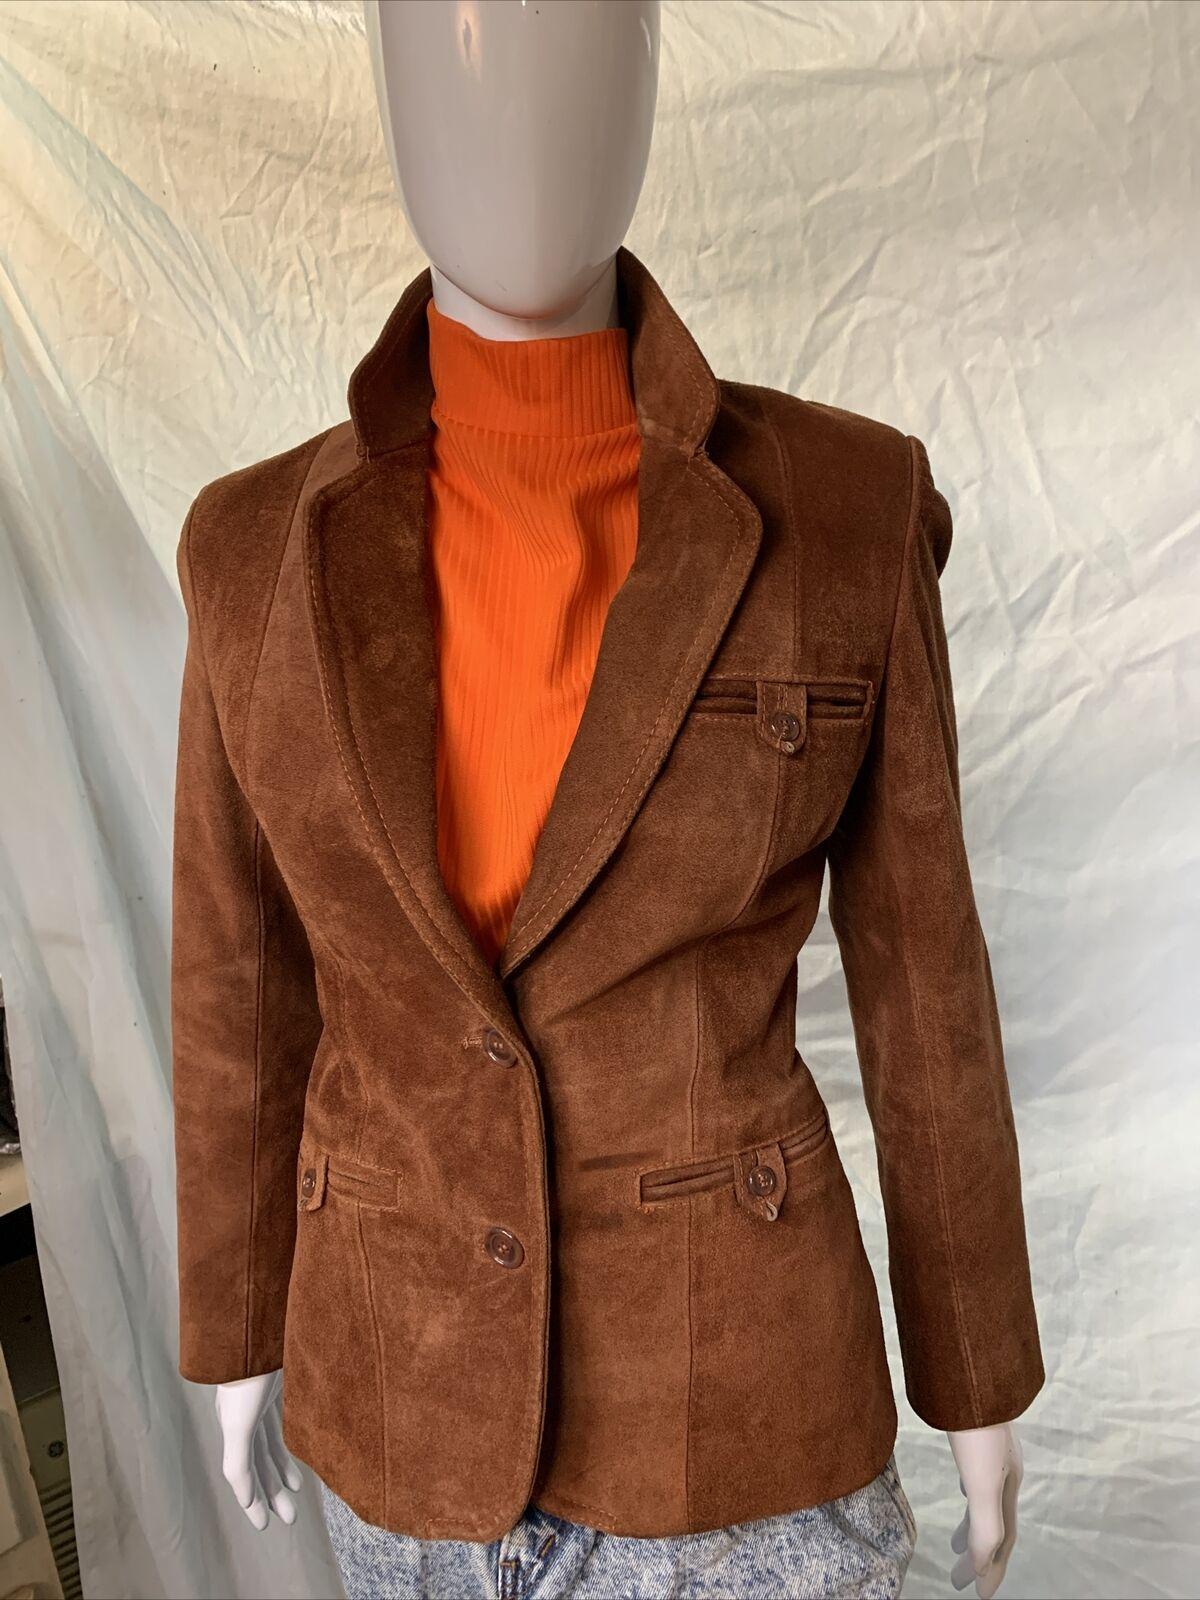 Vintage 1970s Casual Corner Leather Suede Brown J… - image 1